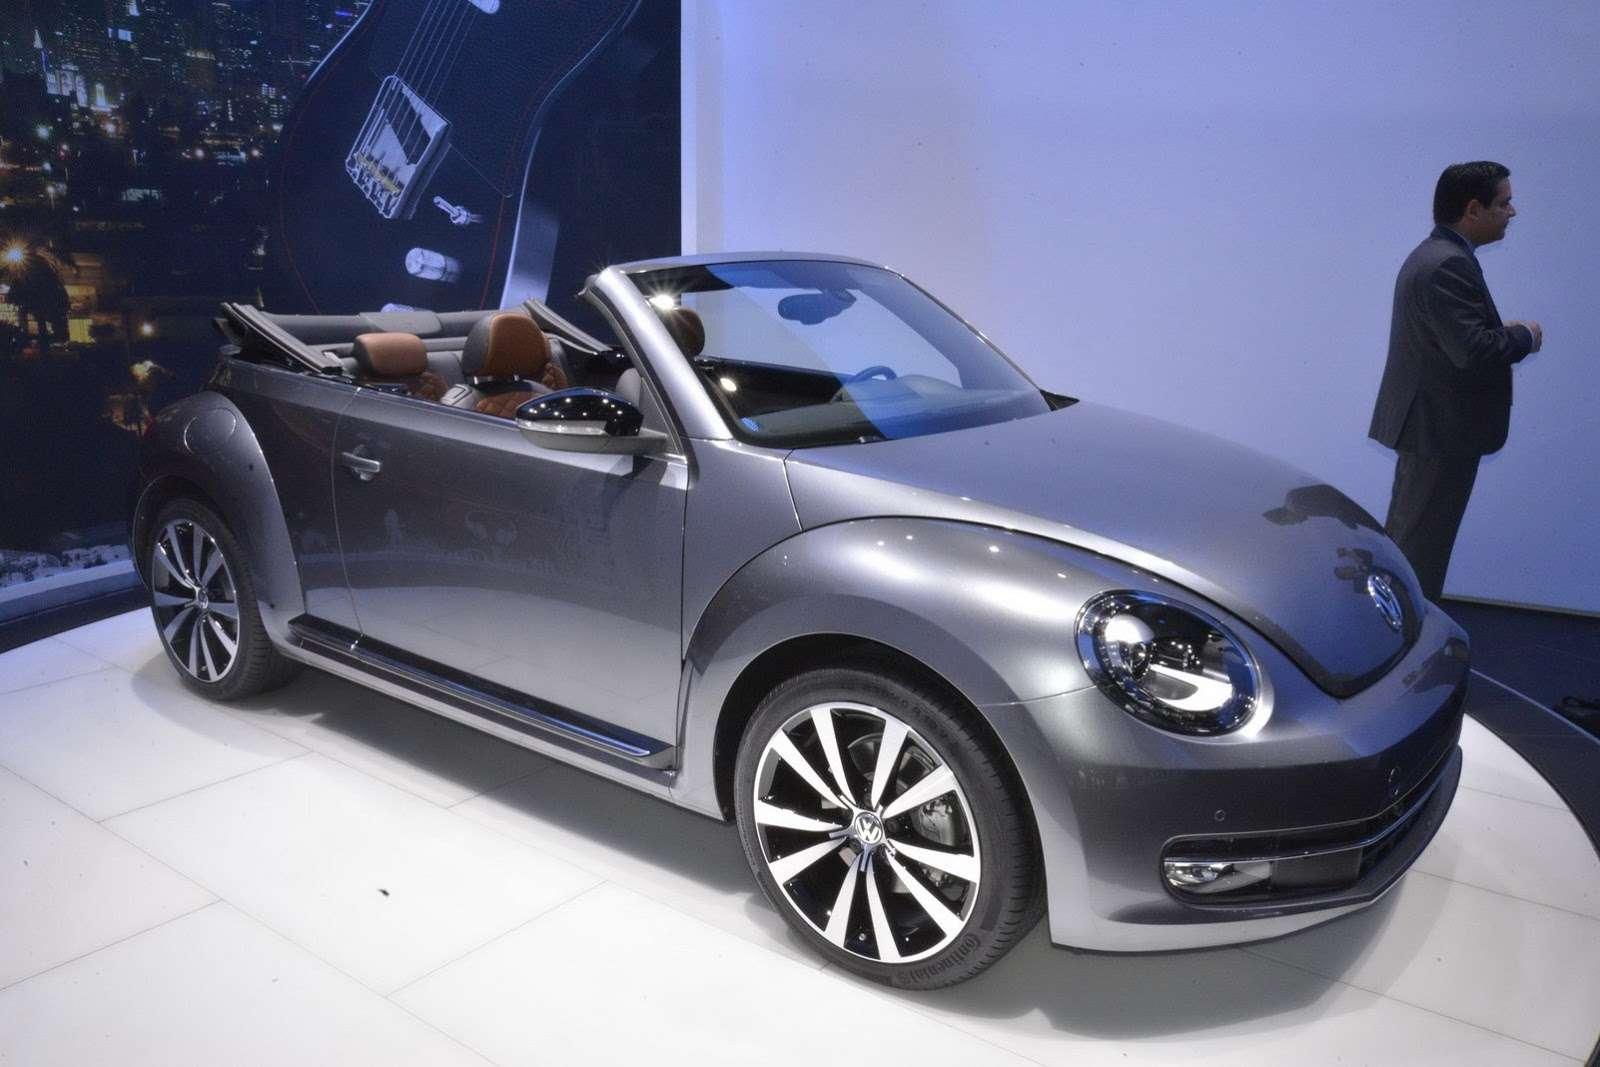 2013 VW Beetle Cabrio